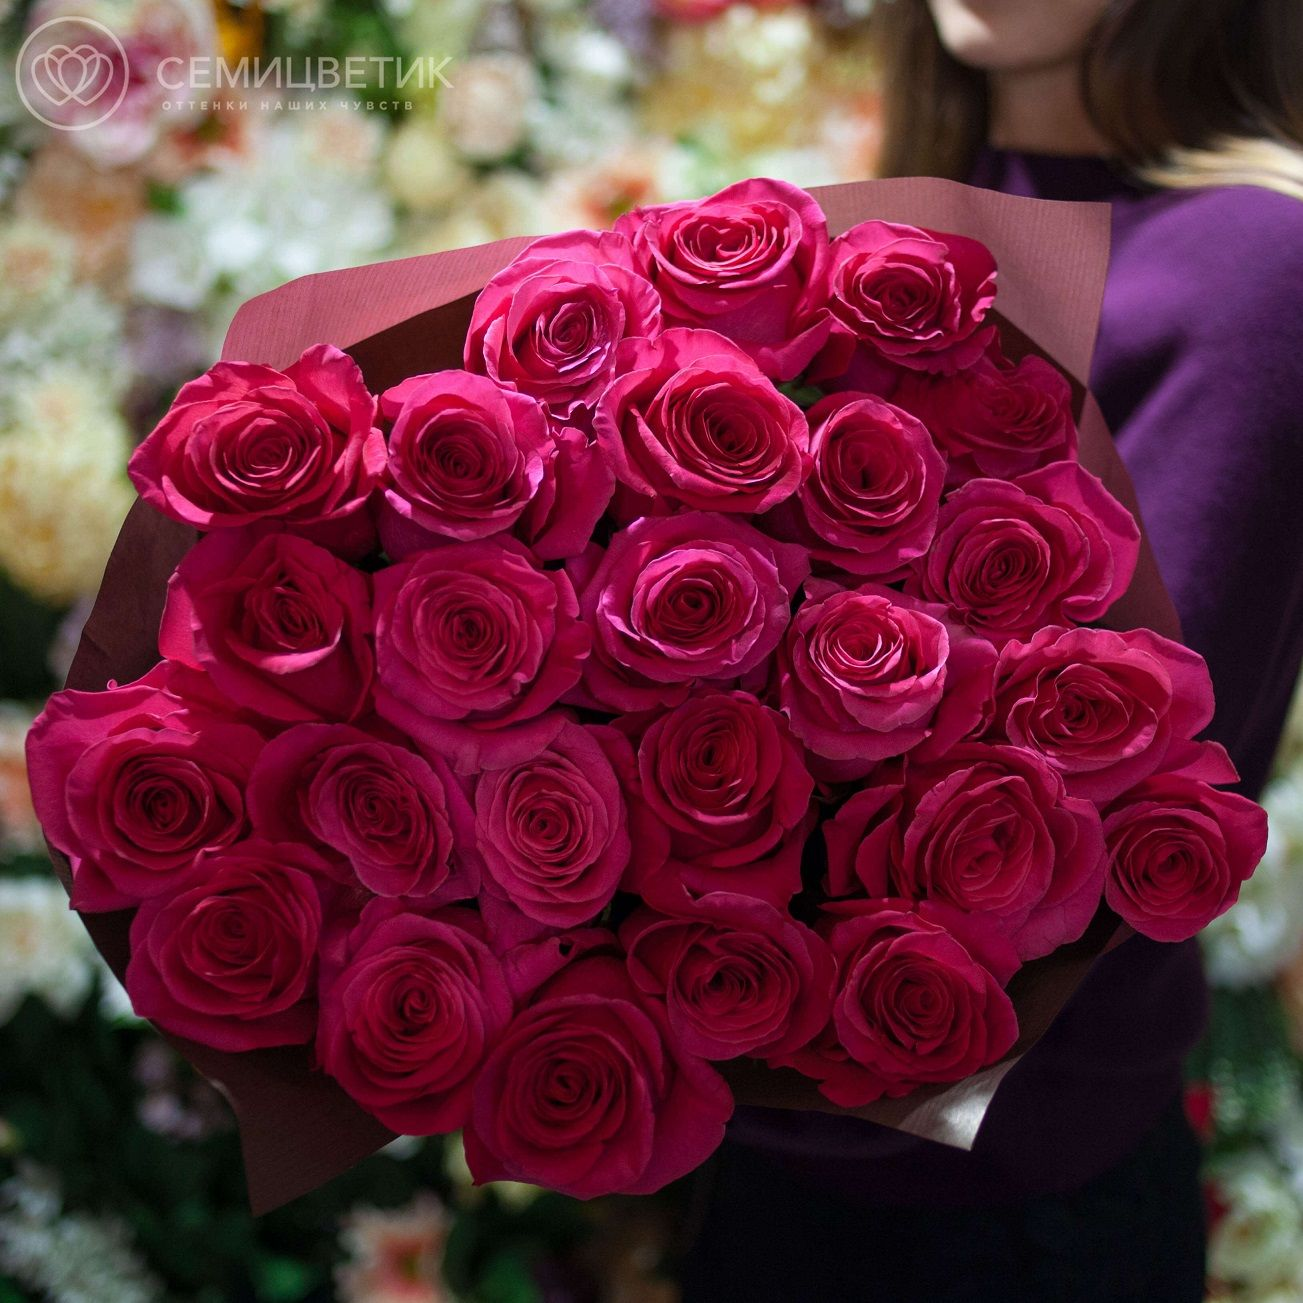 25 розовых роз Pink Floyd 90 см фото